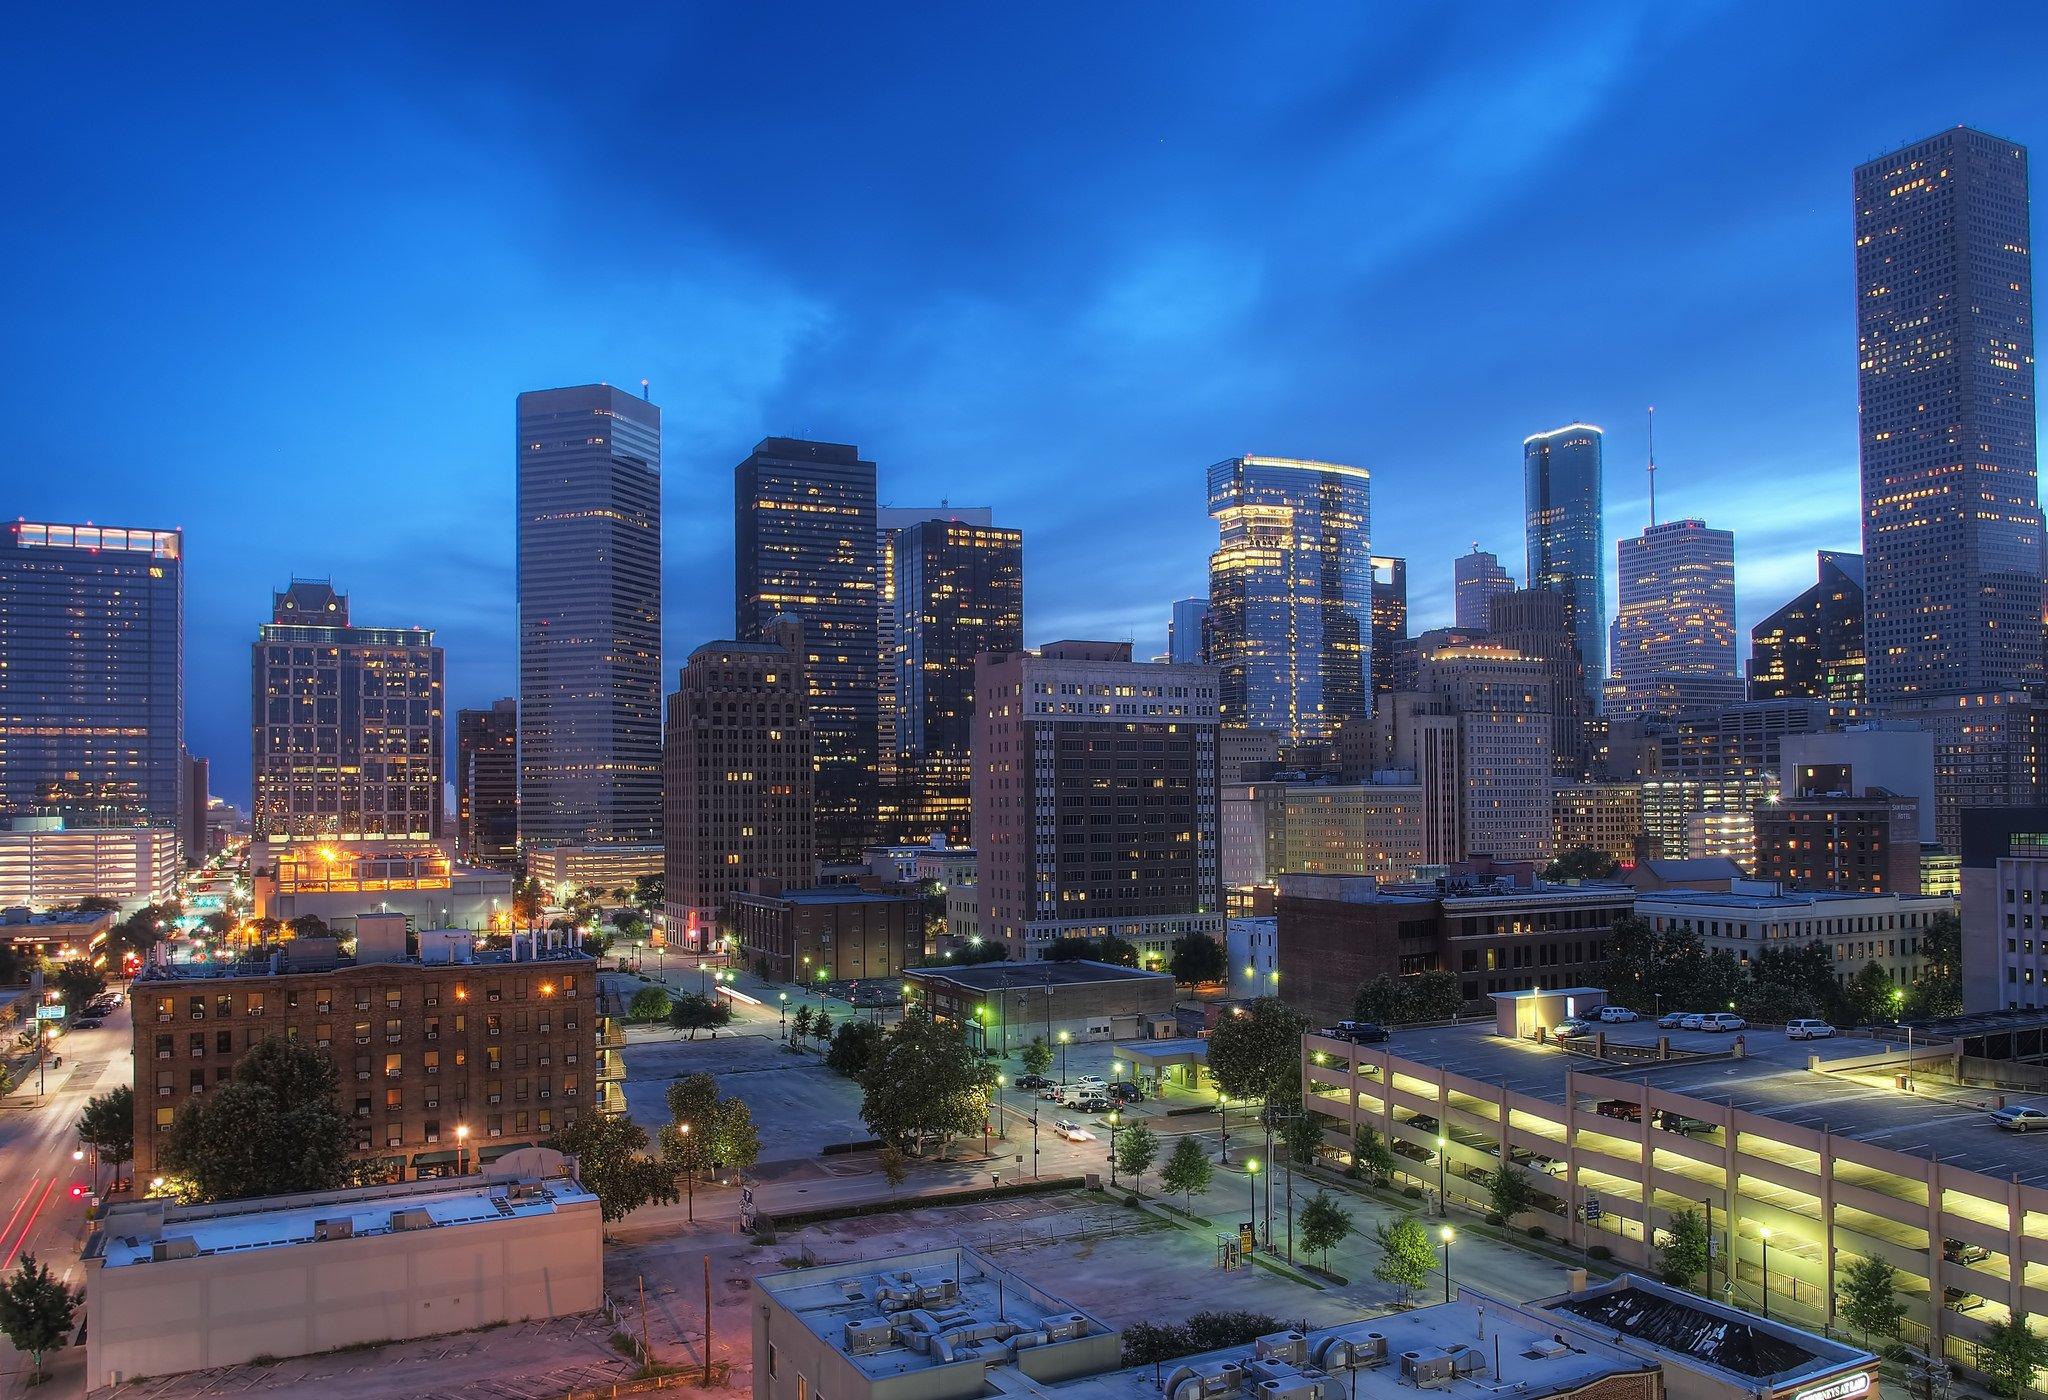 Houston architecture bridges cities City texas Night towers buildings 2048x1400